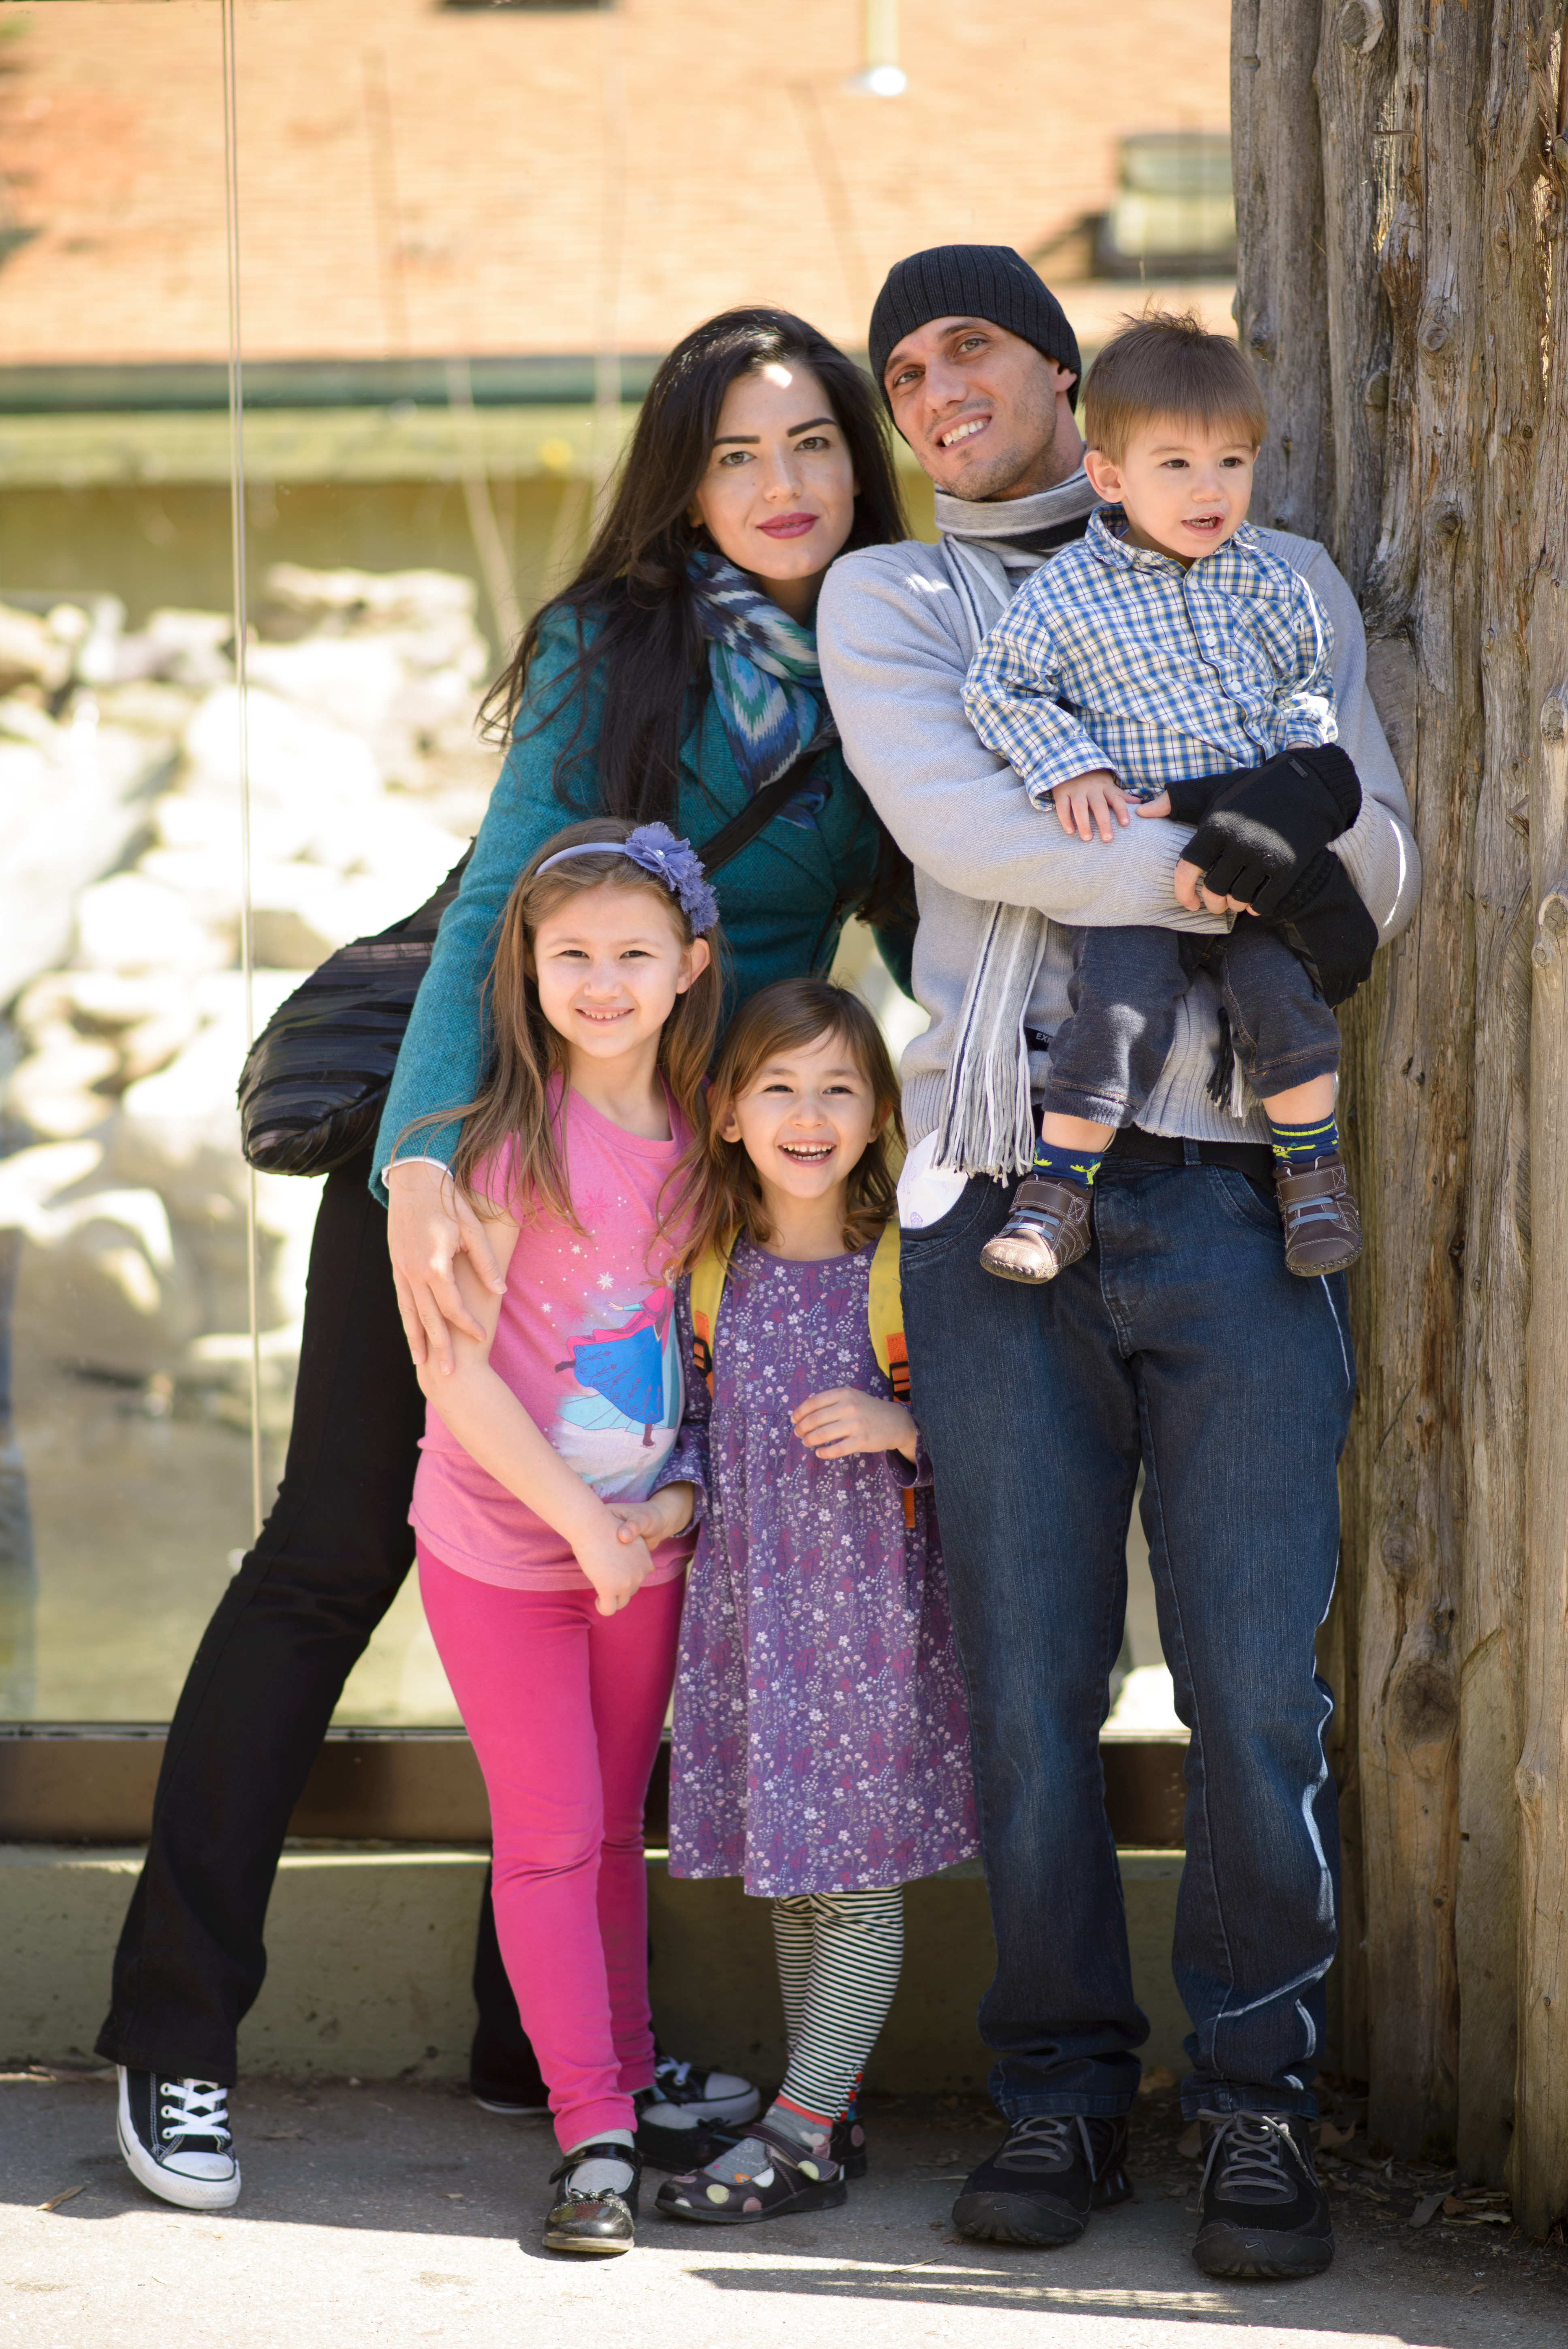 Josie, Bruna, Celia, Javi and Ewan